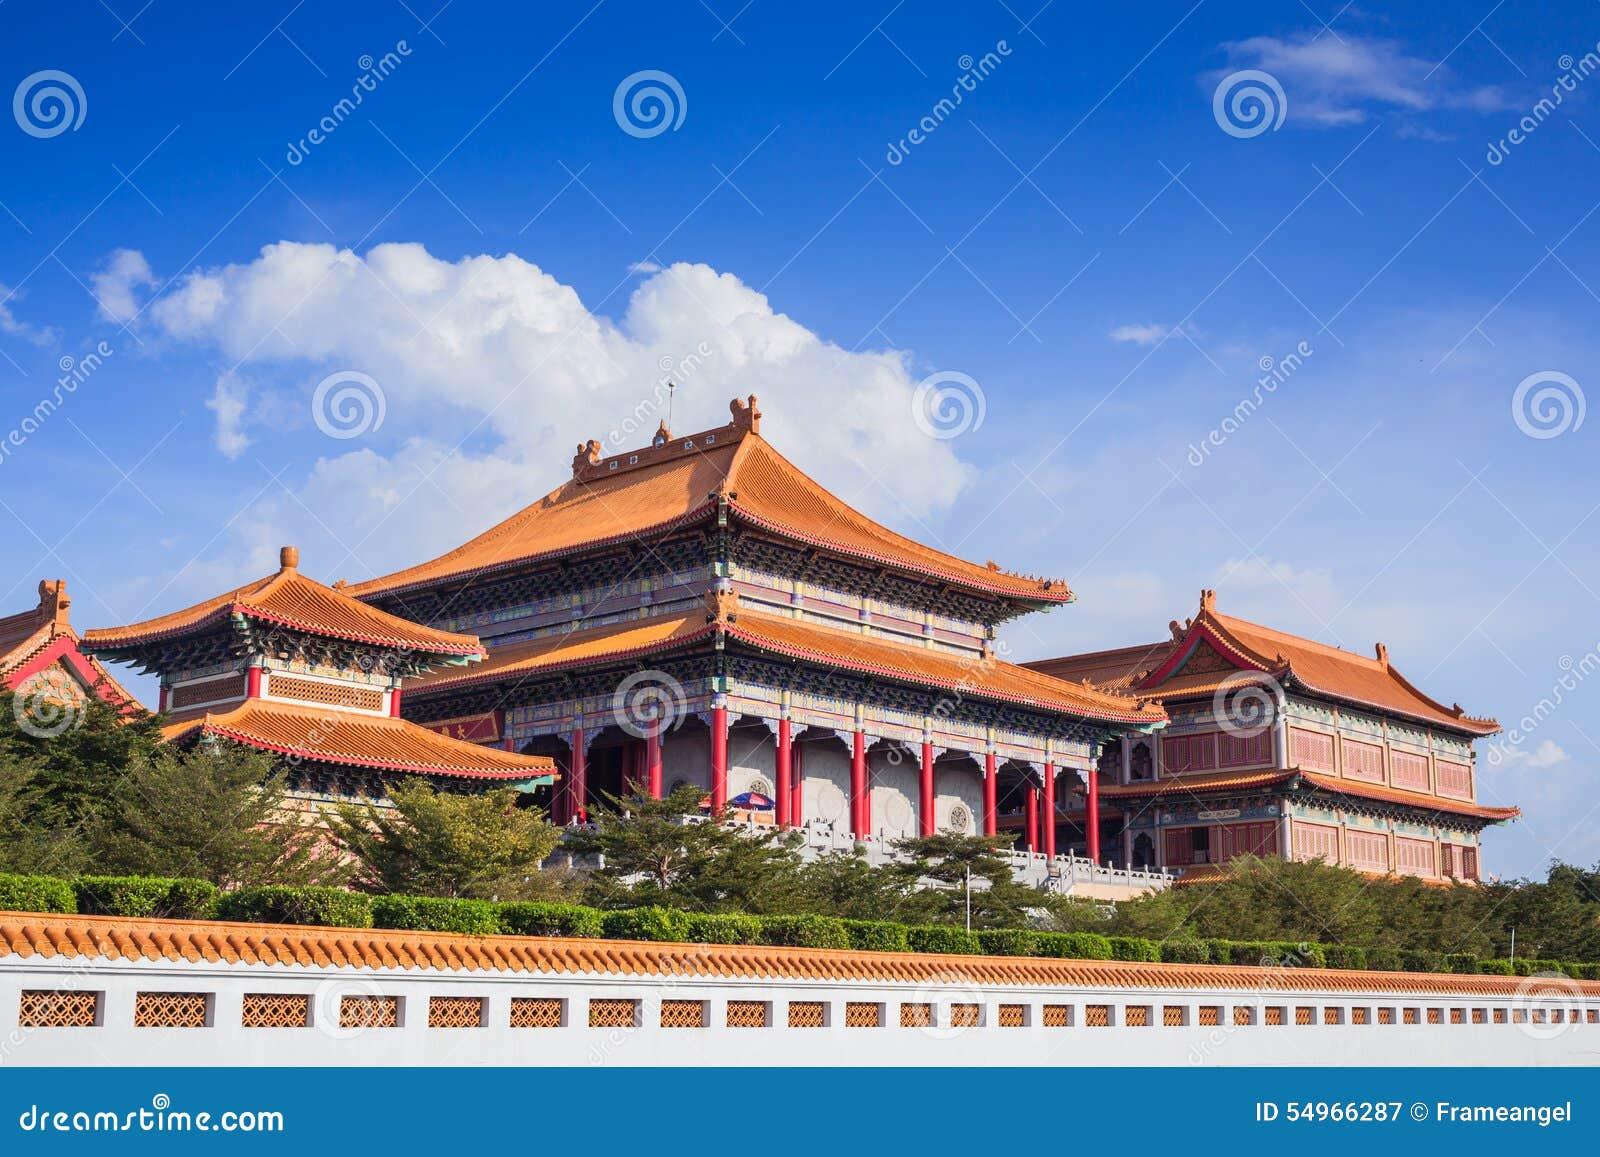 Chinese Buddhist Temple In Bangkok Names Stock Image - Image